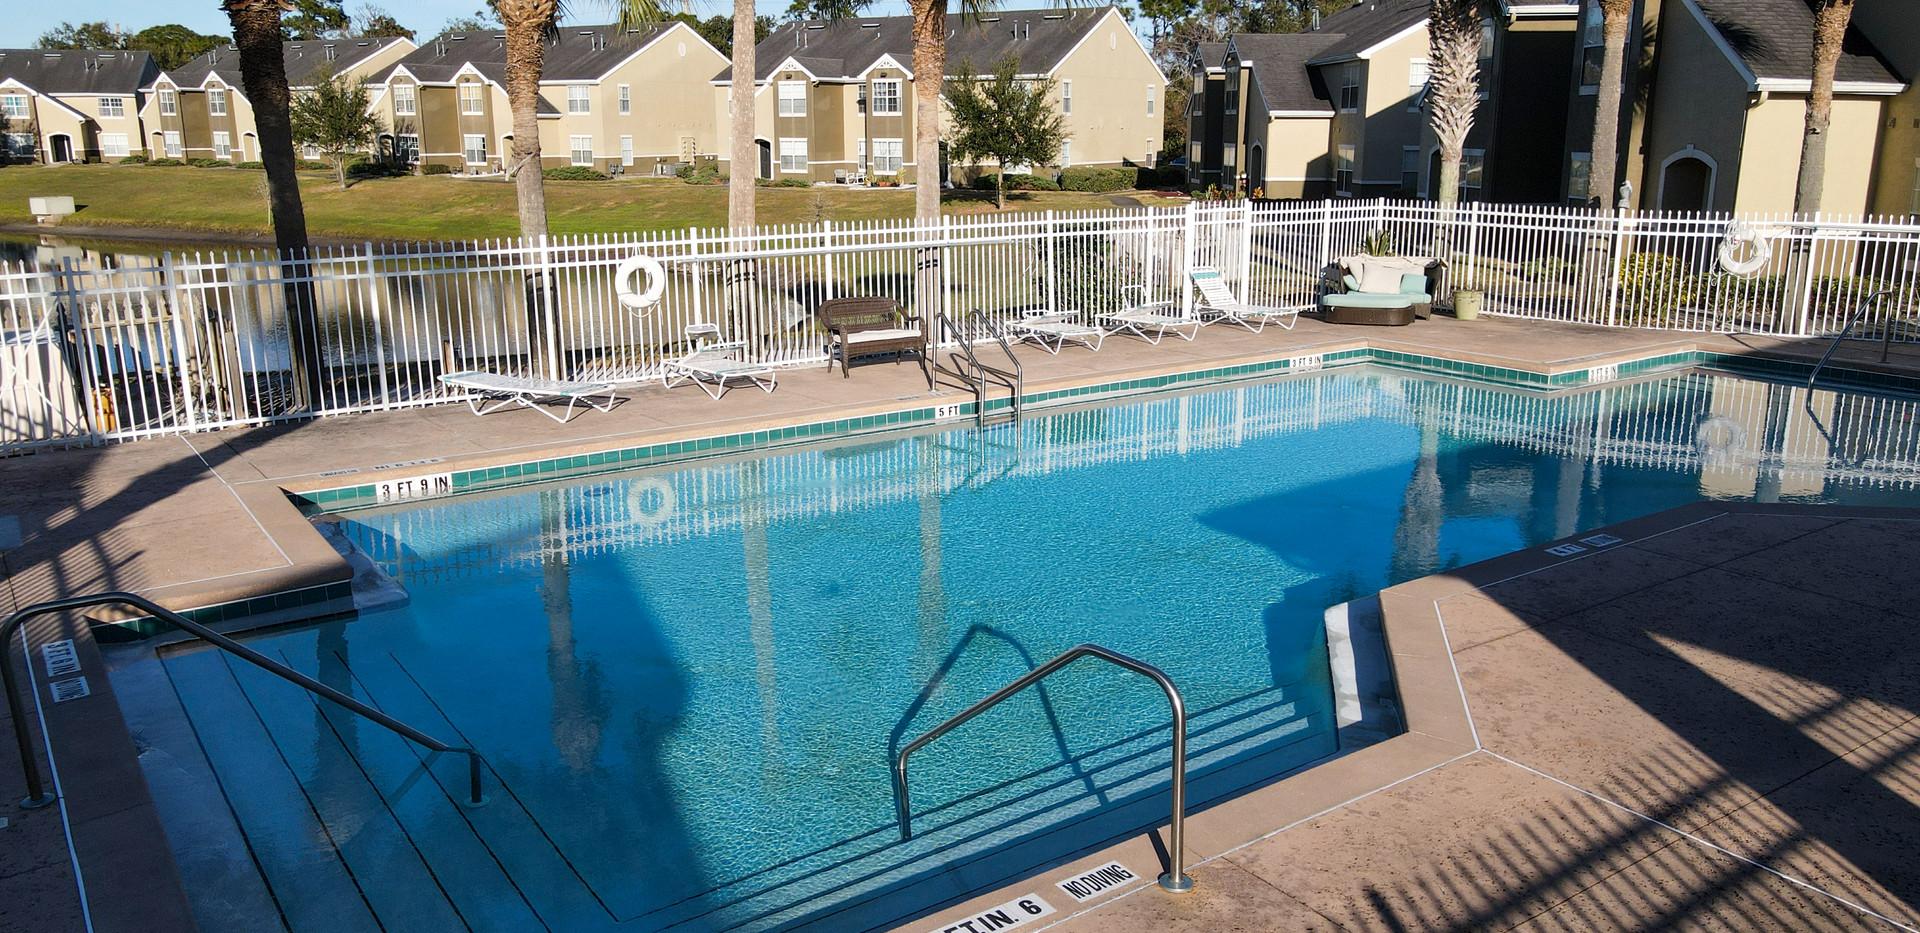 Hickory Pointe Senior Pool